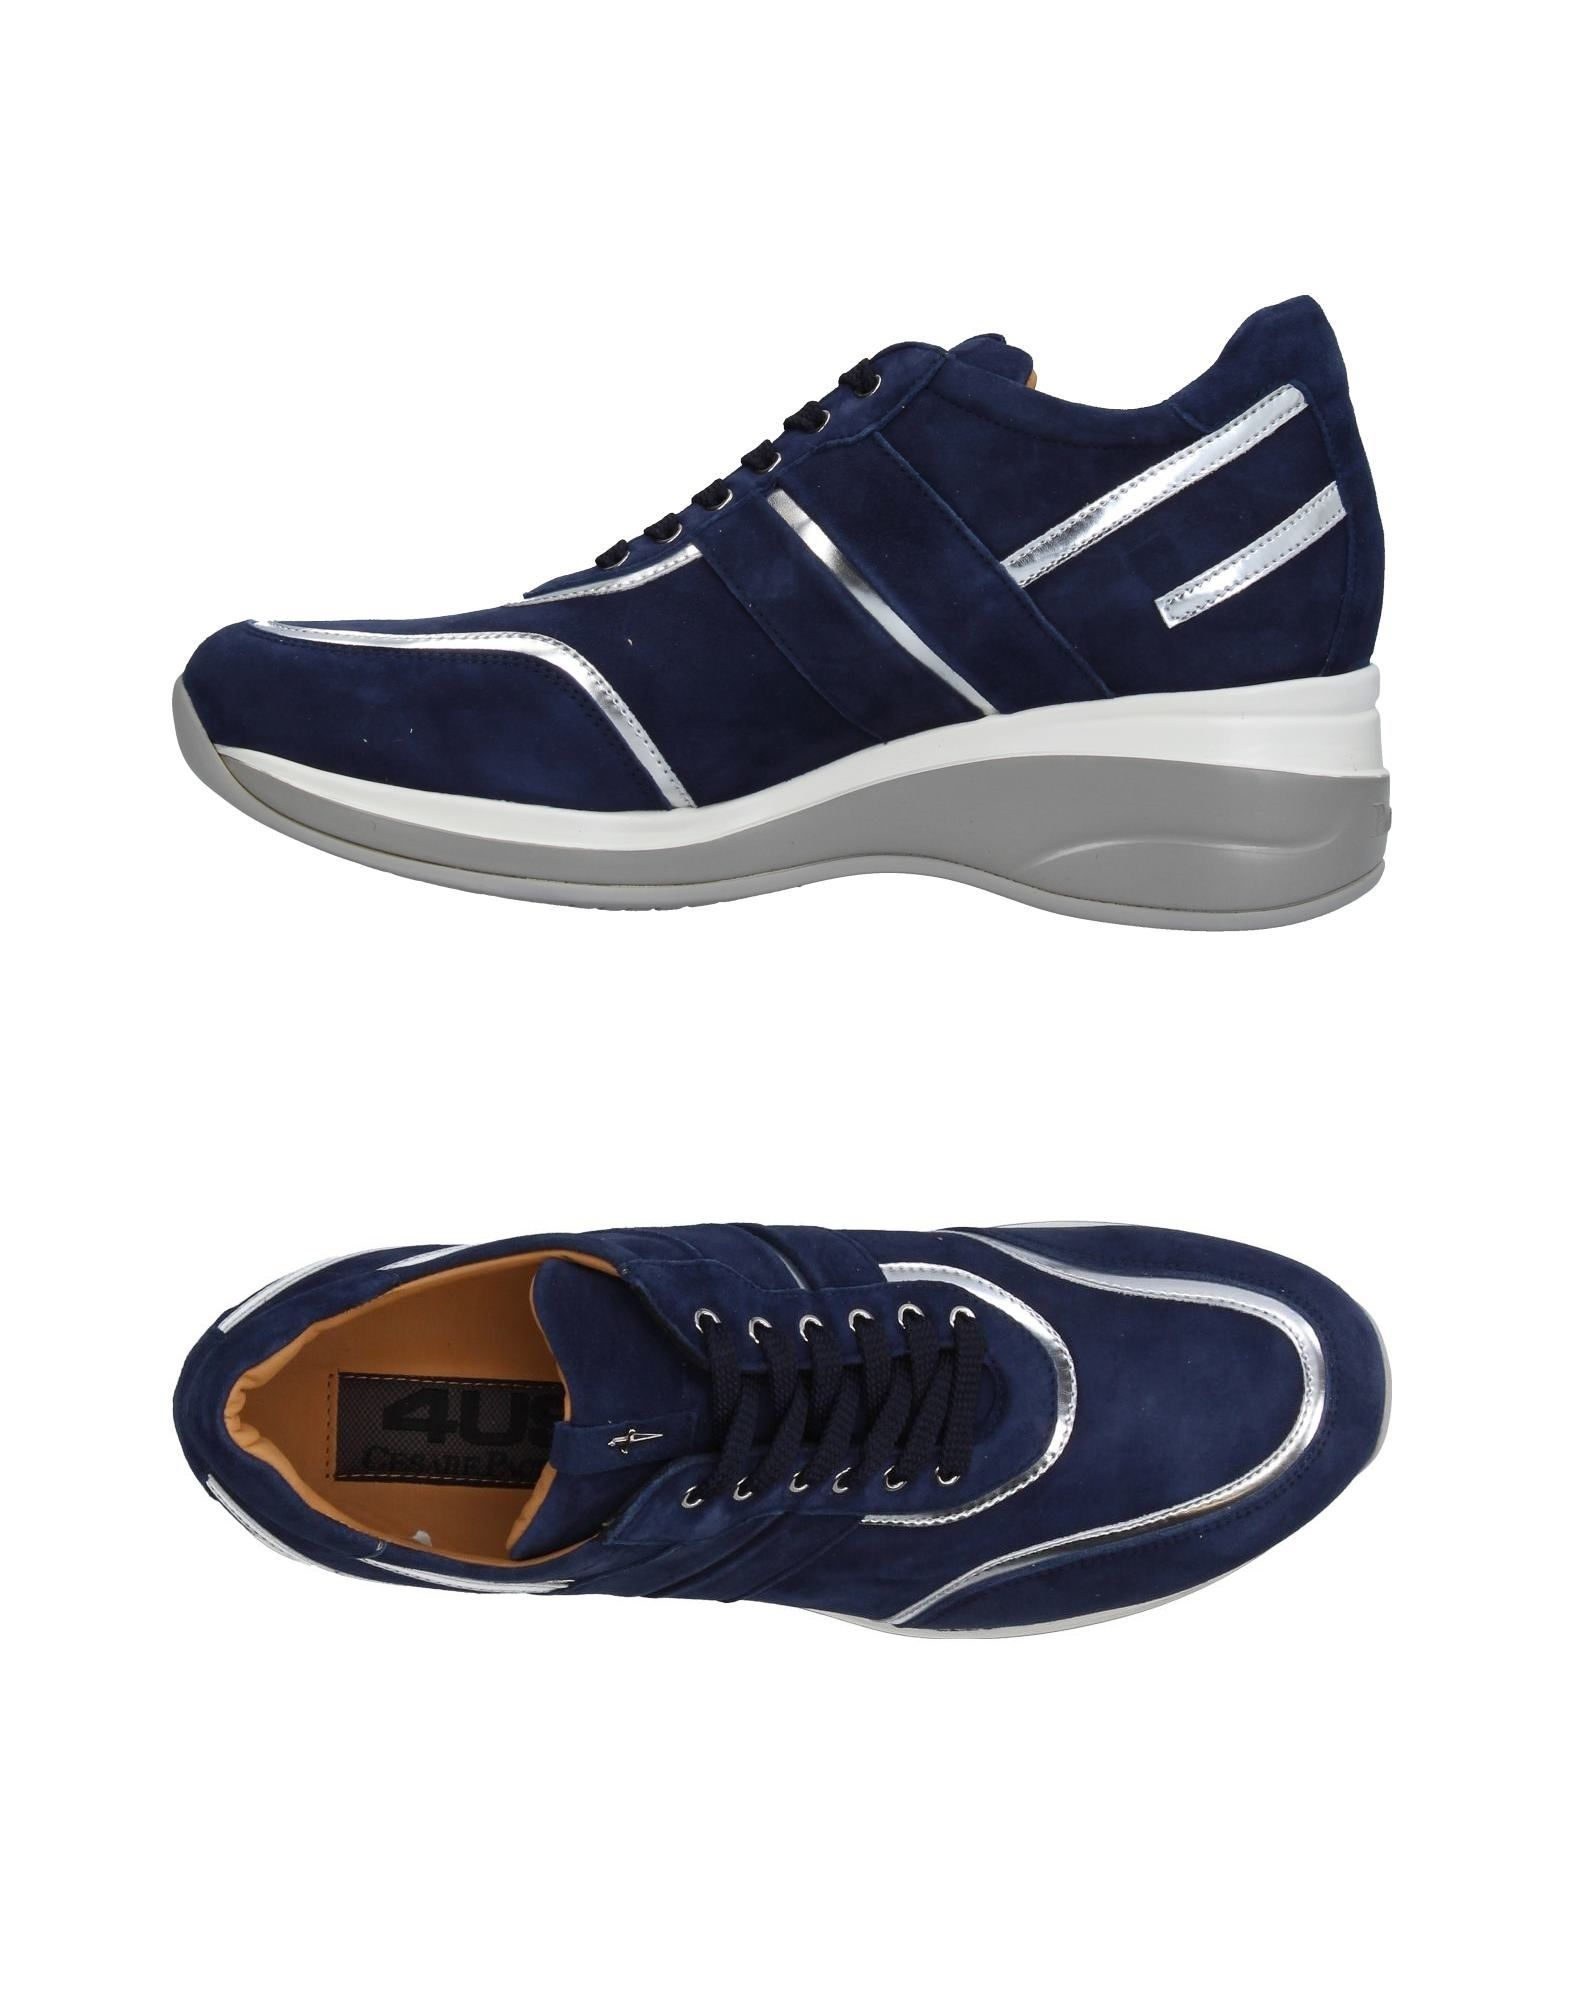 Cesare Paciotti 4Us Sneakers Damen  11386330RO Gute Qualität beliebte Schuhe